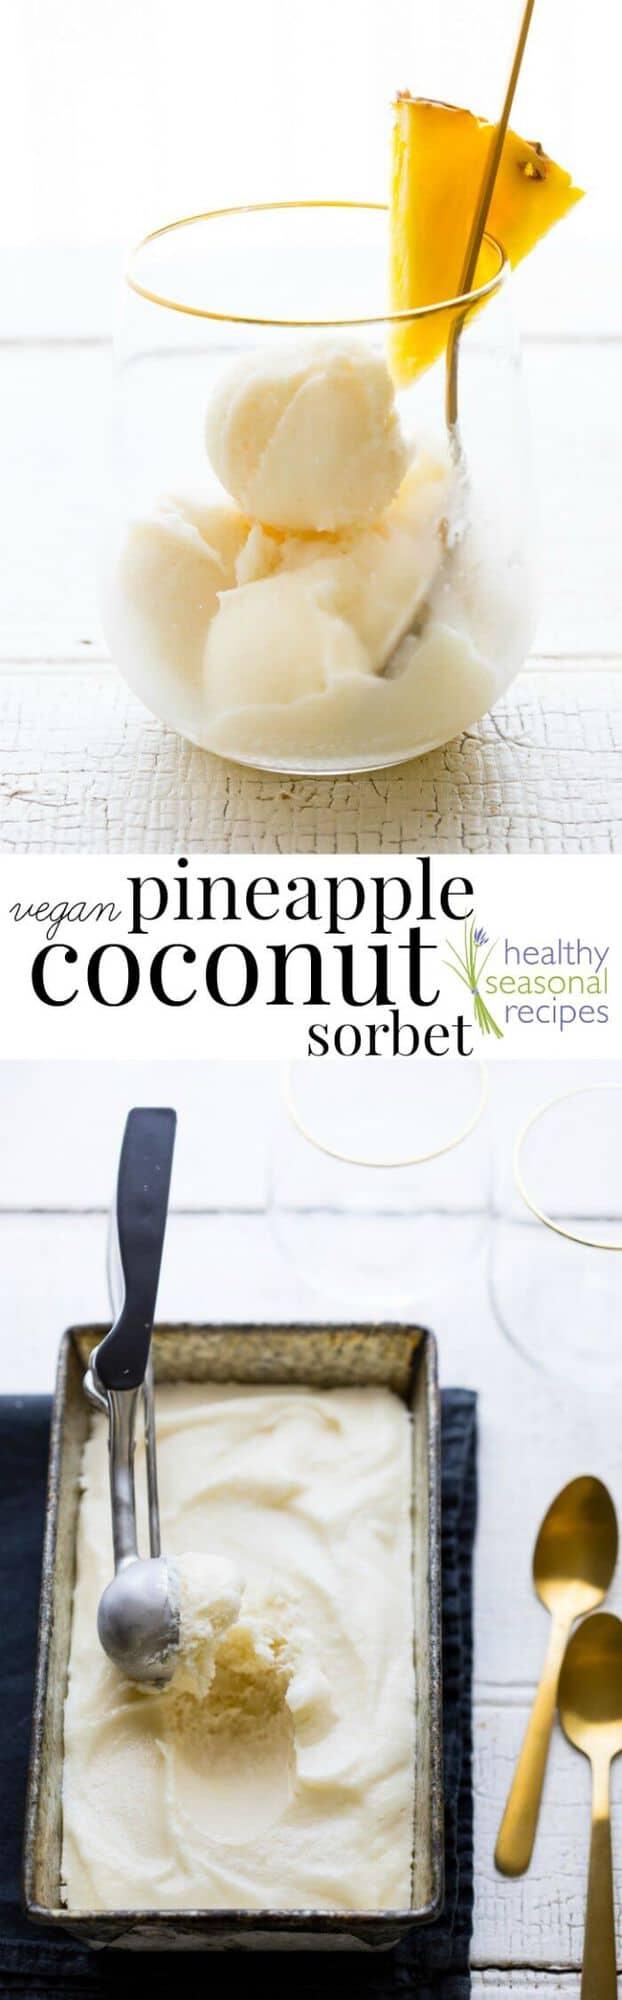 Coconut sorbet collage